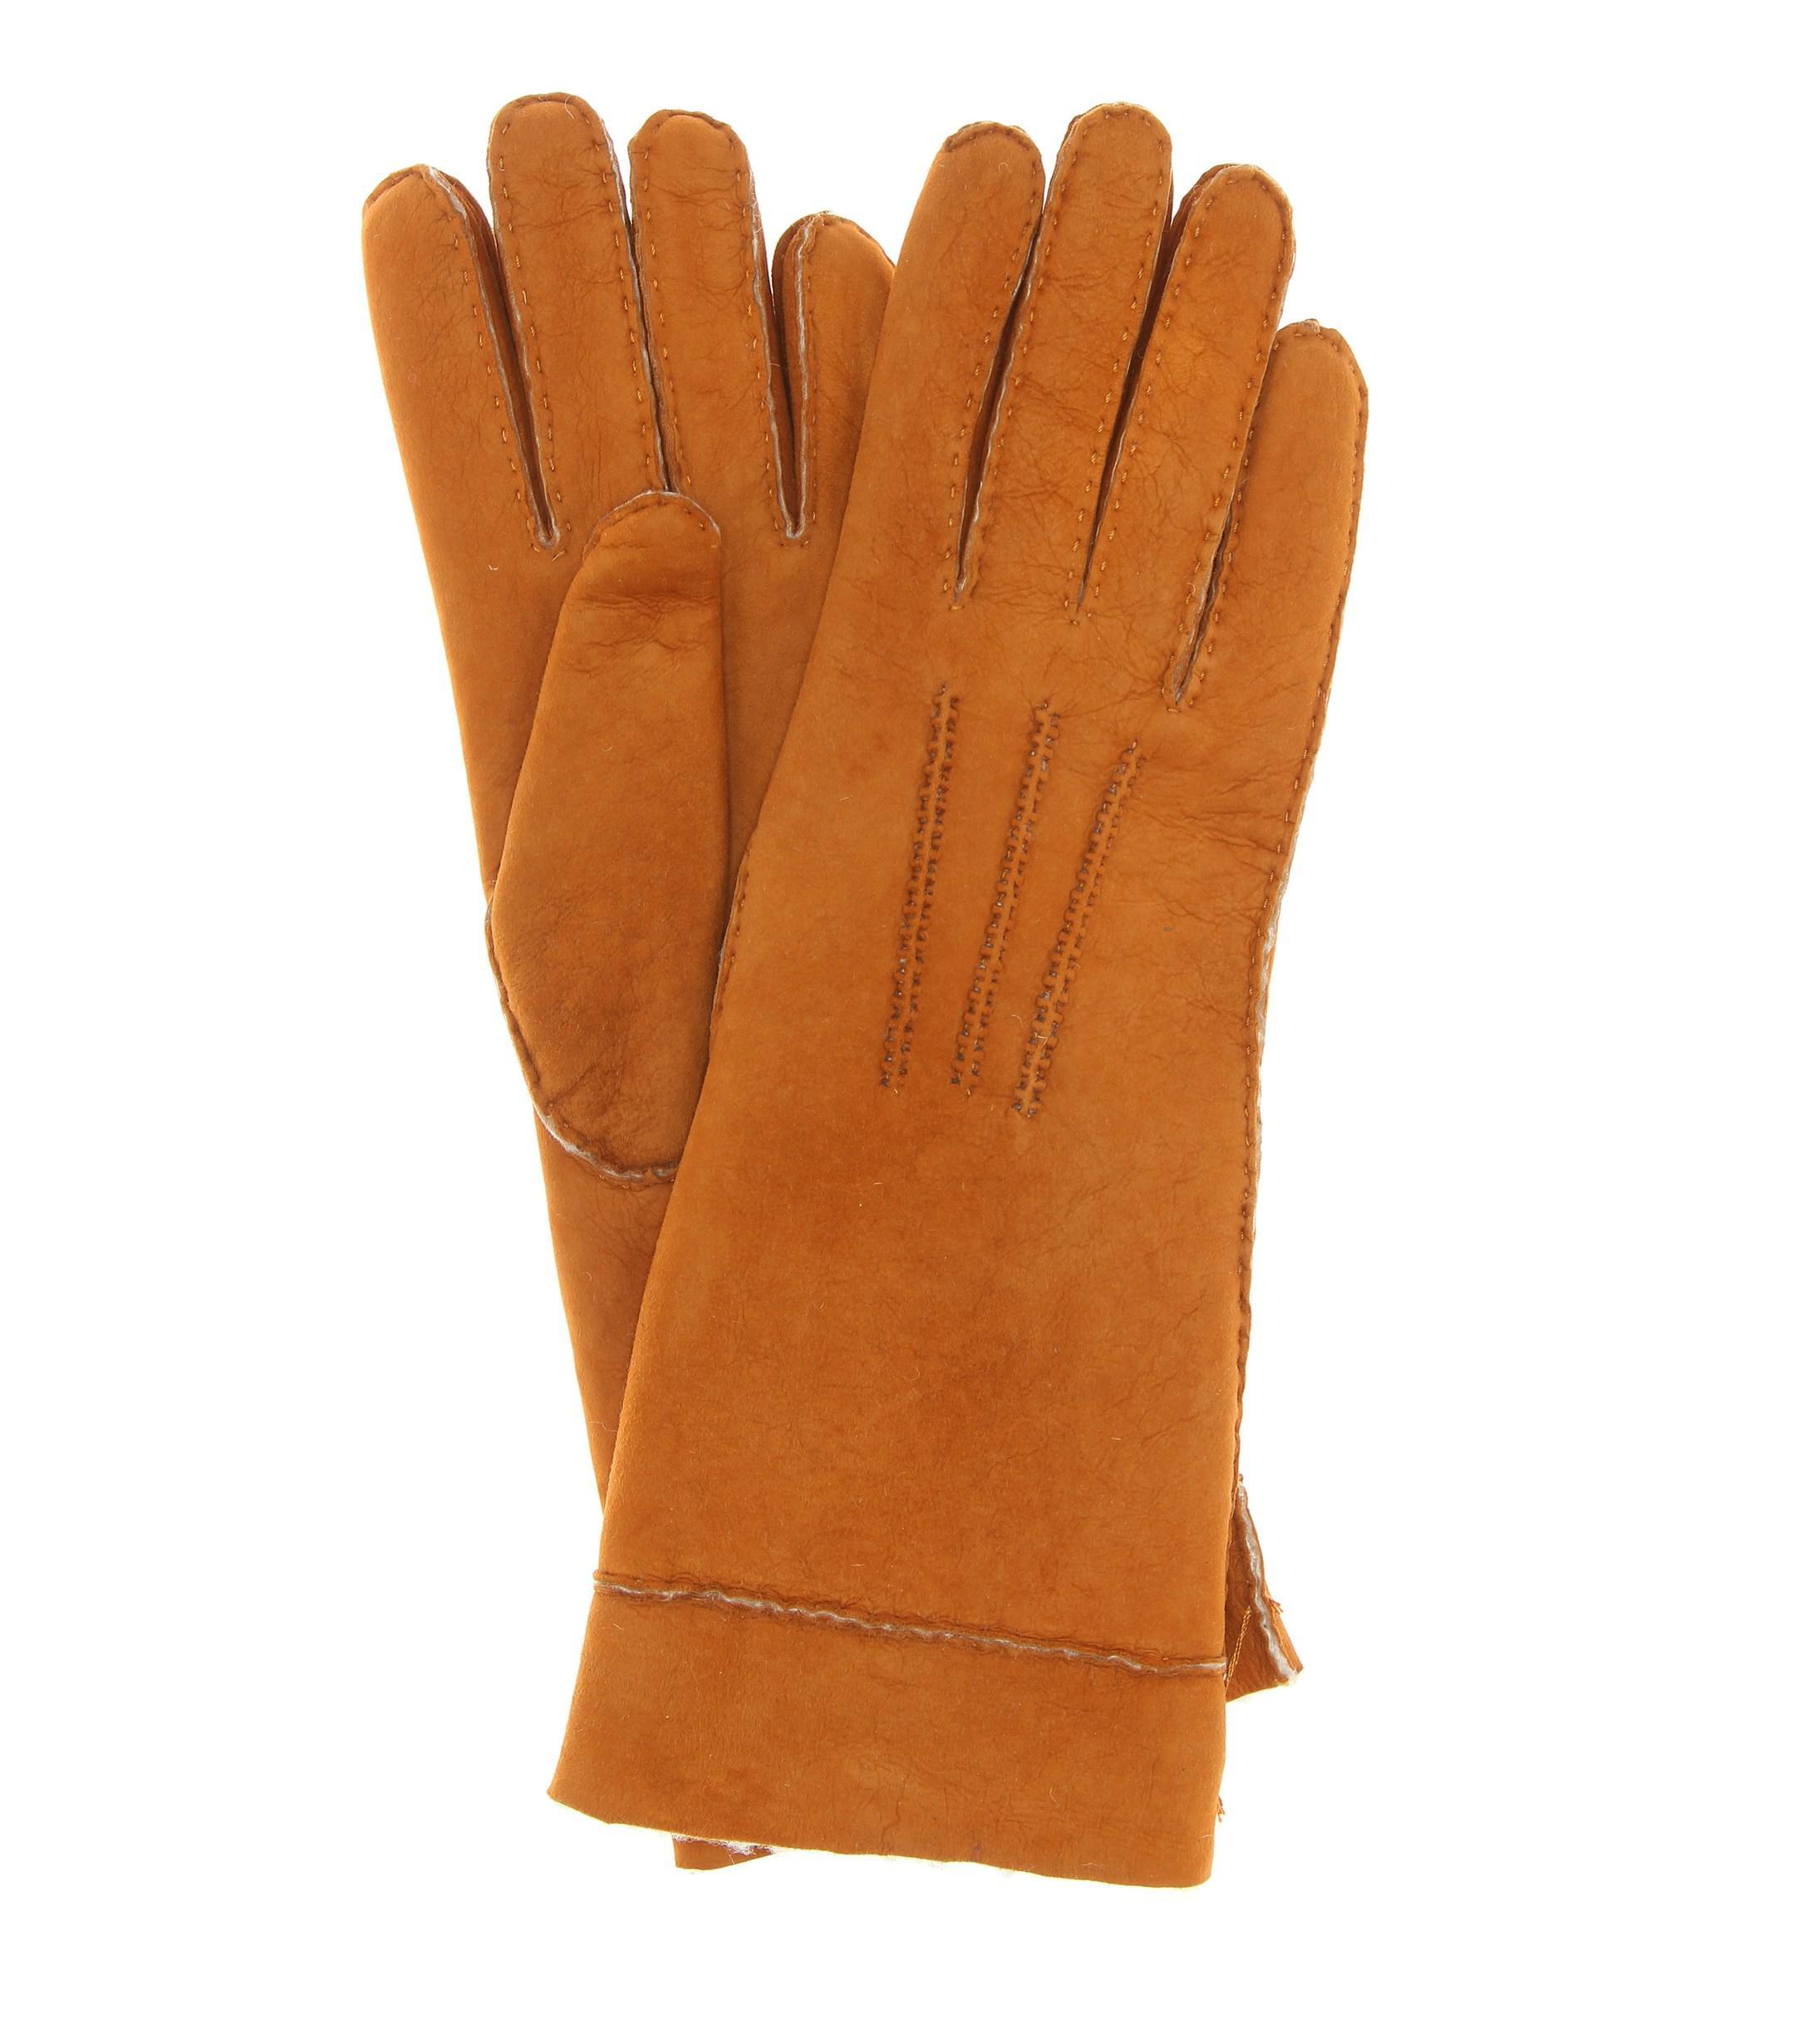 e0c34c8adb1cc5 Isabel Marant Handschuhe Yupiks aus Leder in Braun - Lyst